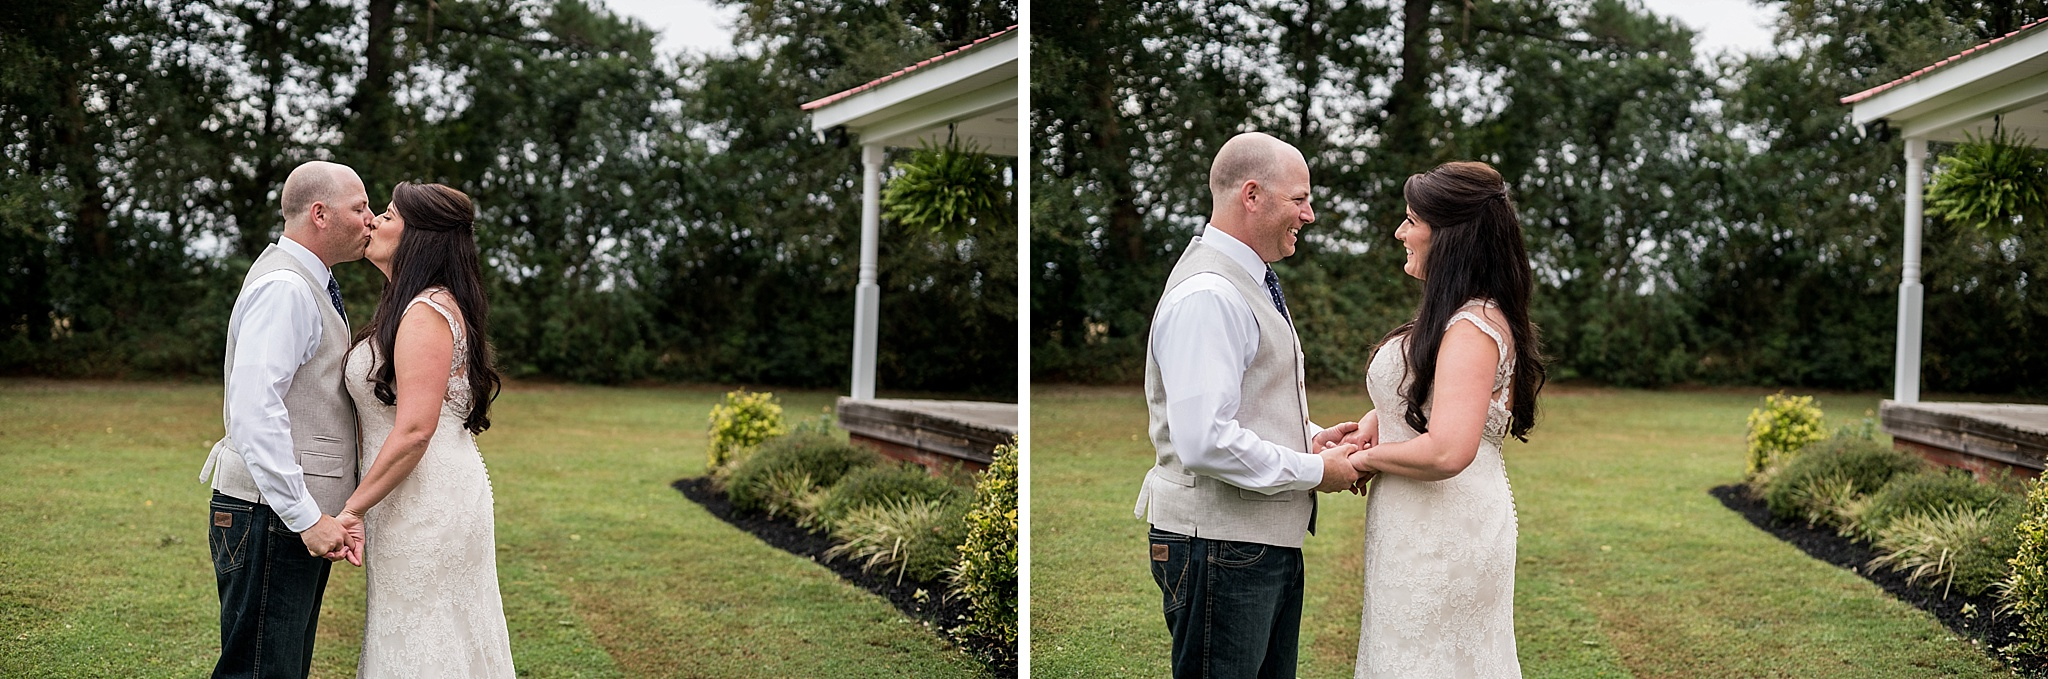 Tarboro-NC-Wedding-Photographer-020.jpg